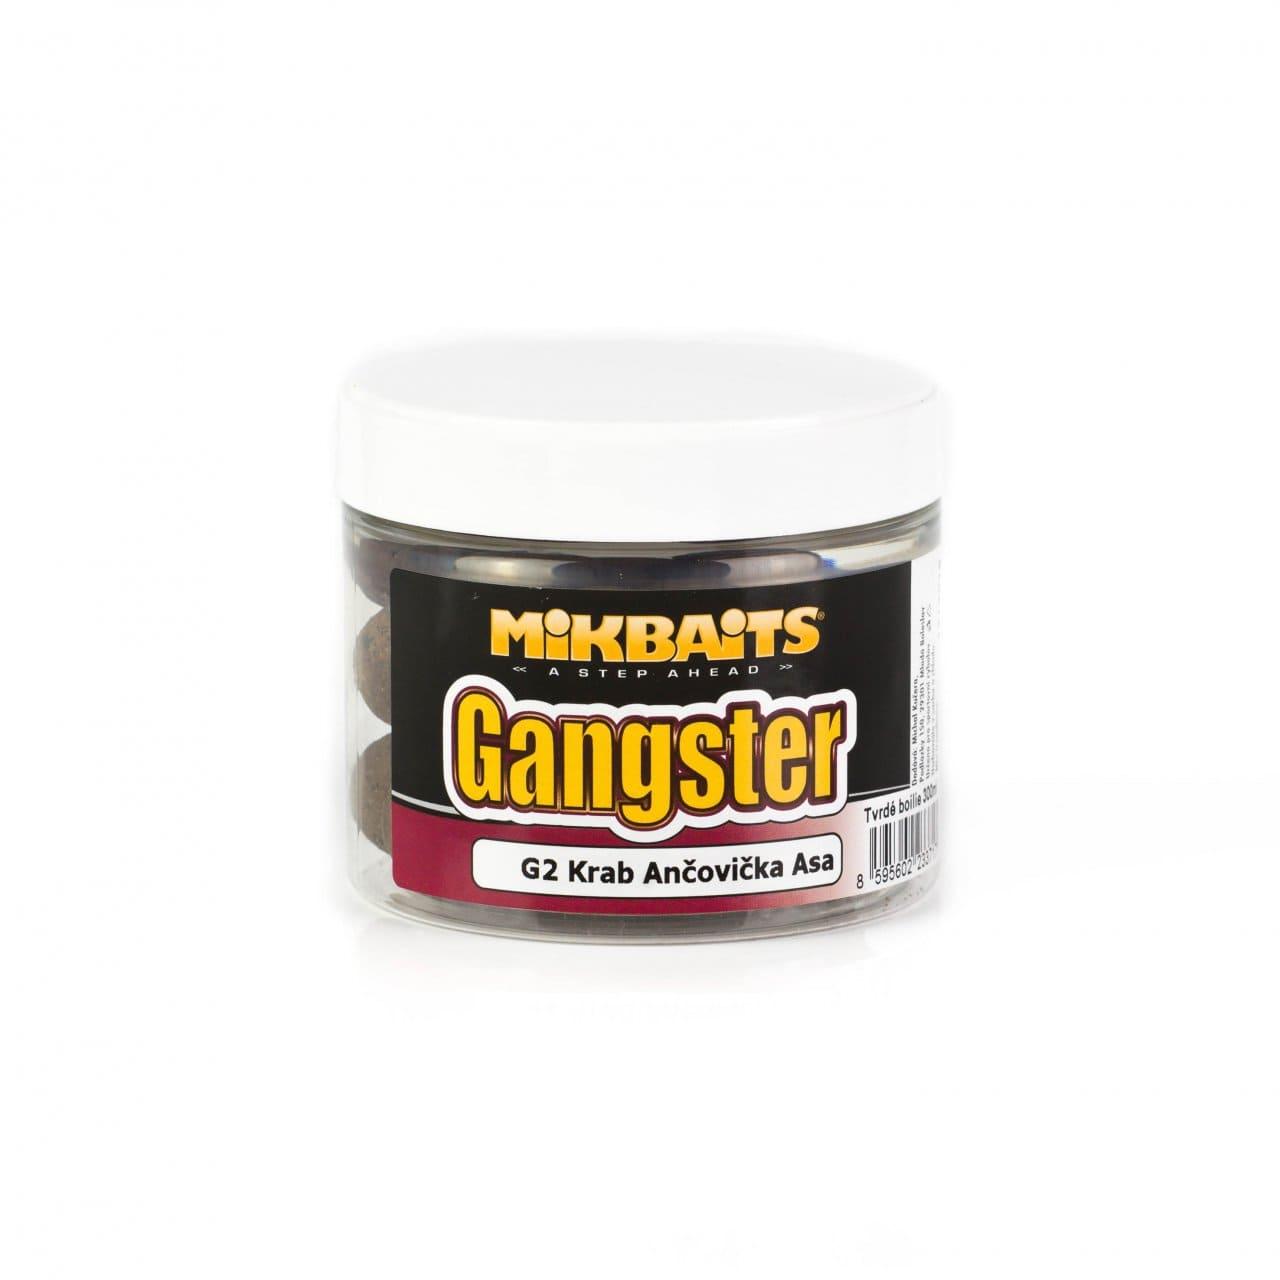 Gangster extra hard boilie 300ml - G2 Krab Ančovička Asa